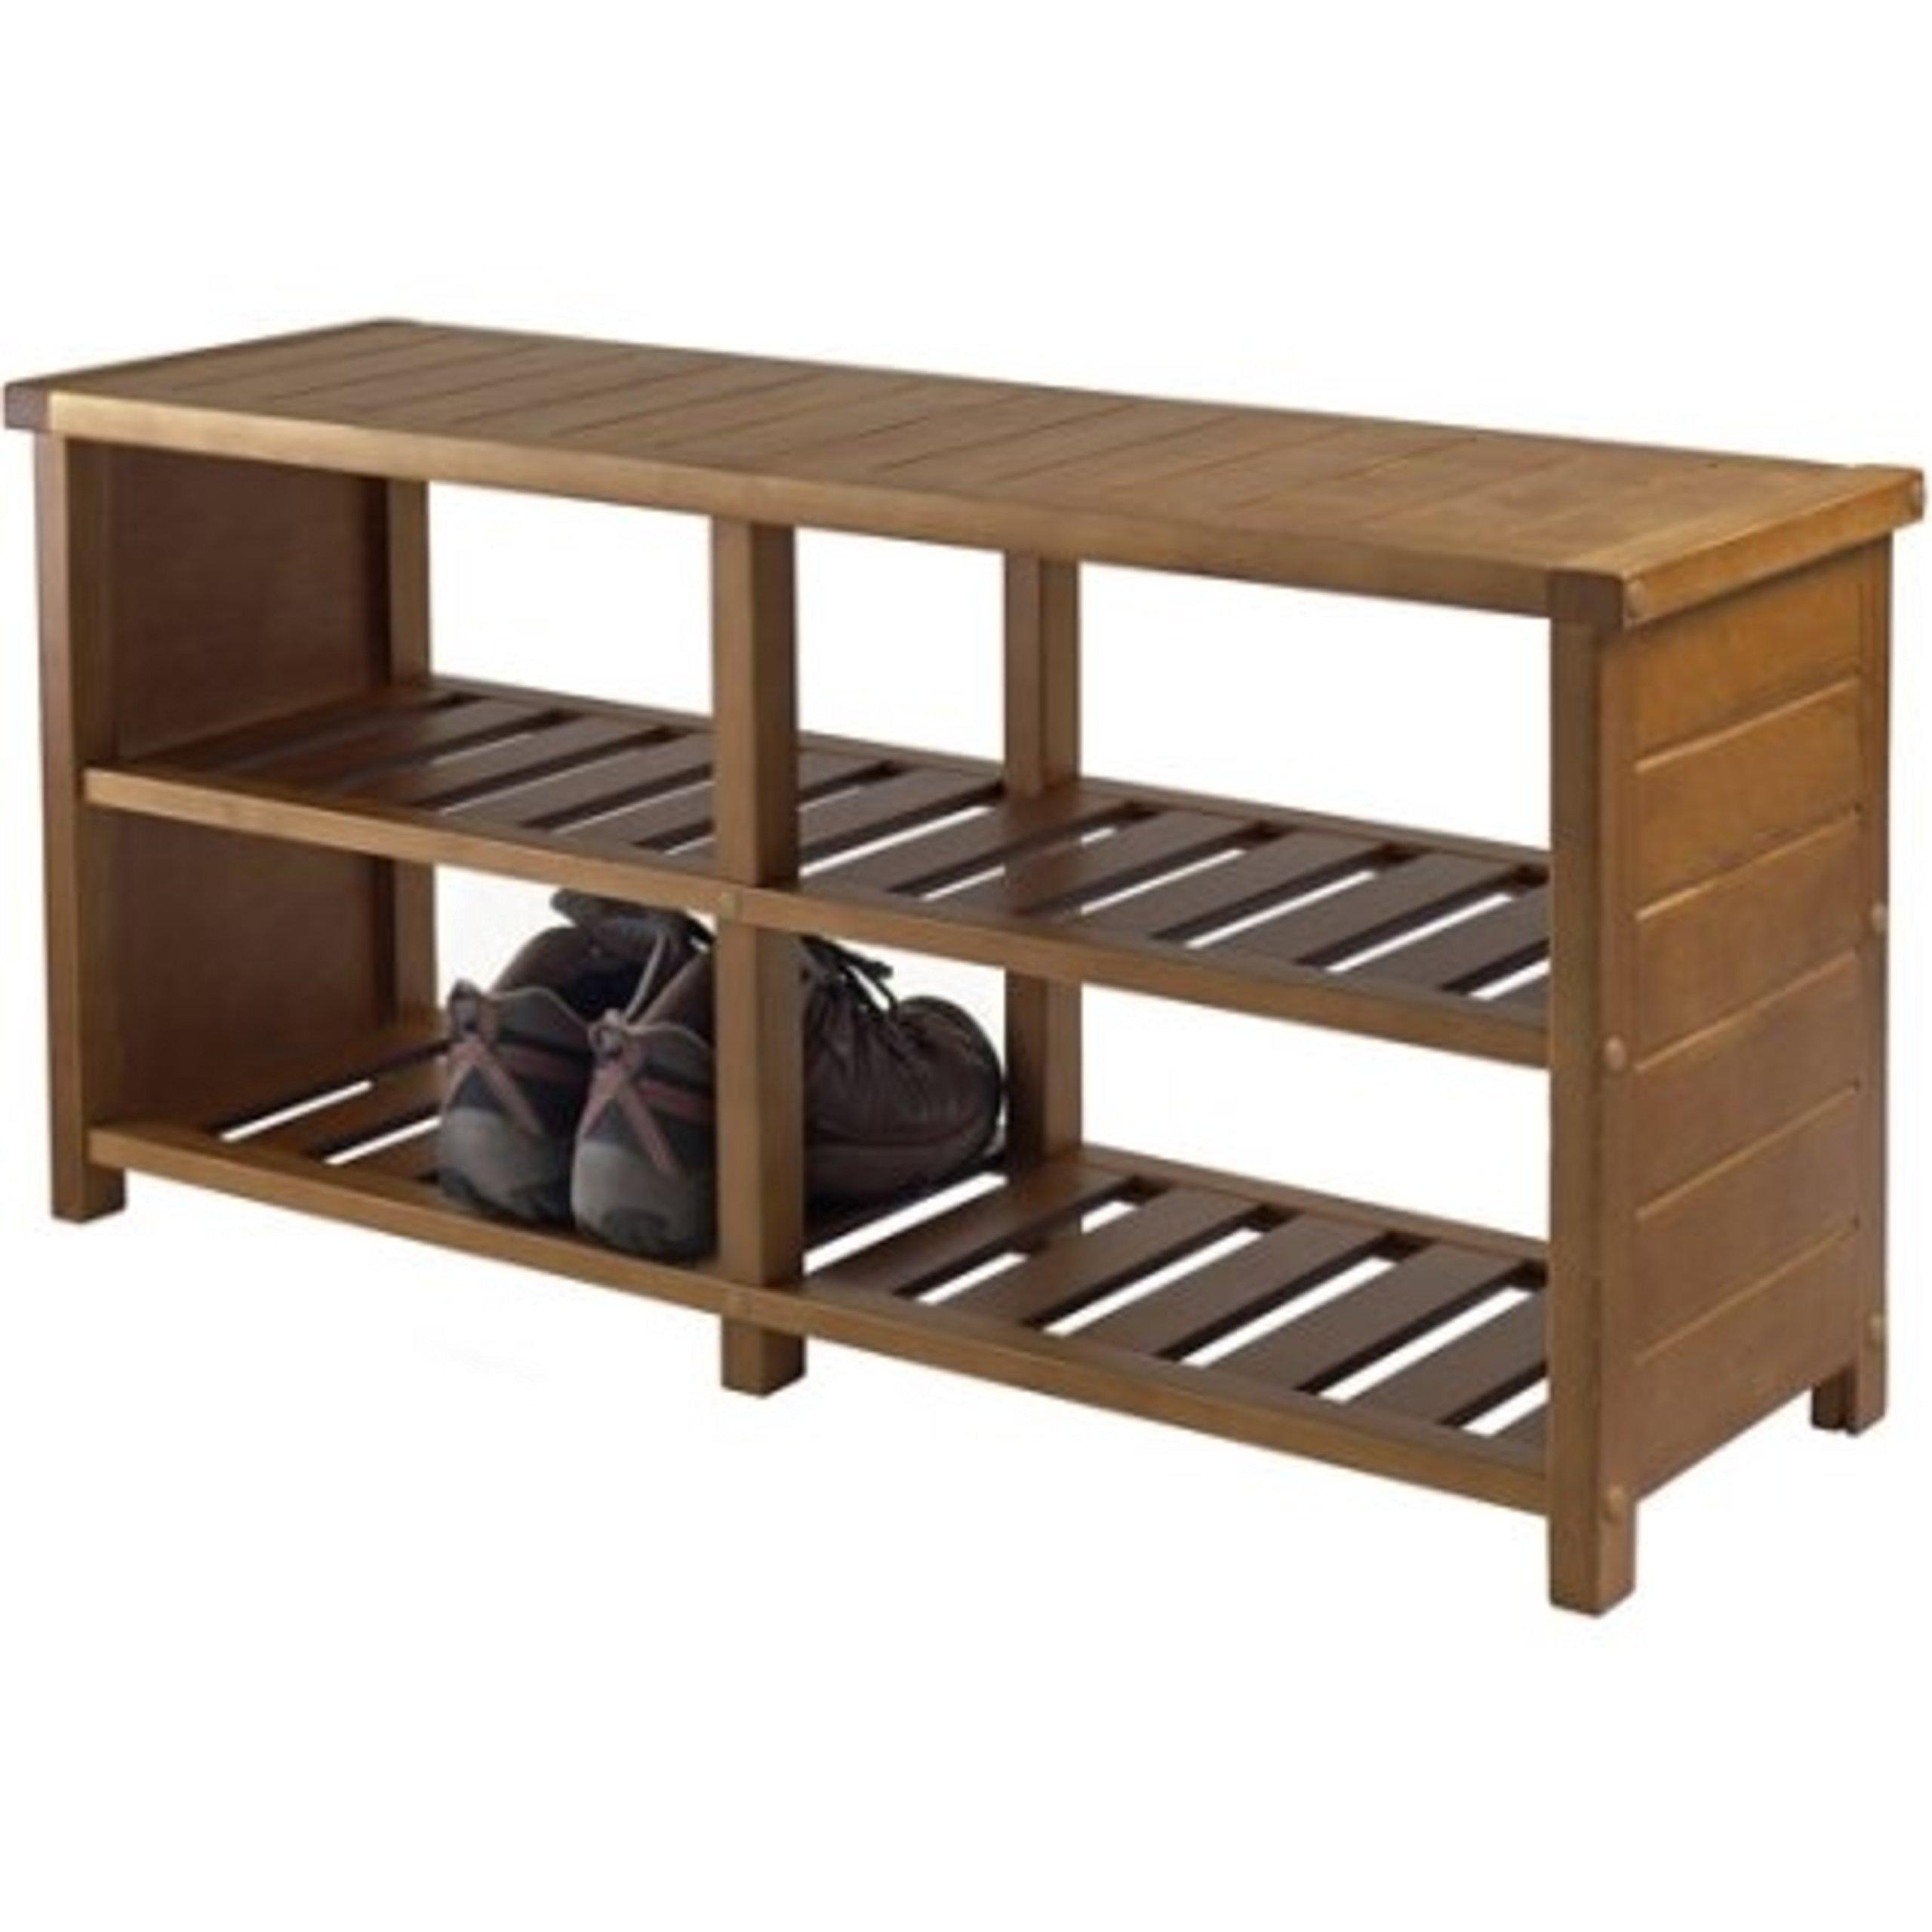 Solid Wood Entryway Slated Shelves Shoe Rack Bench, Teak